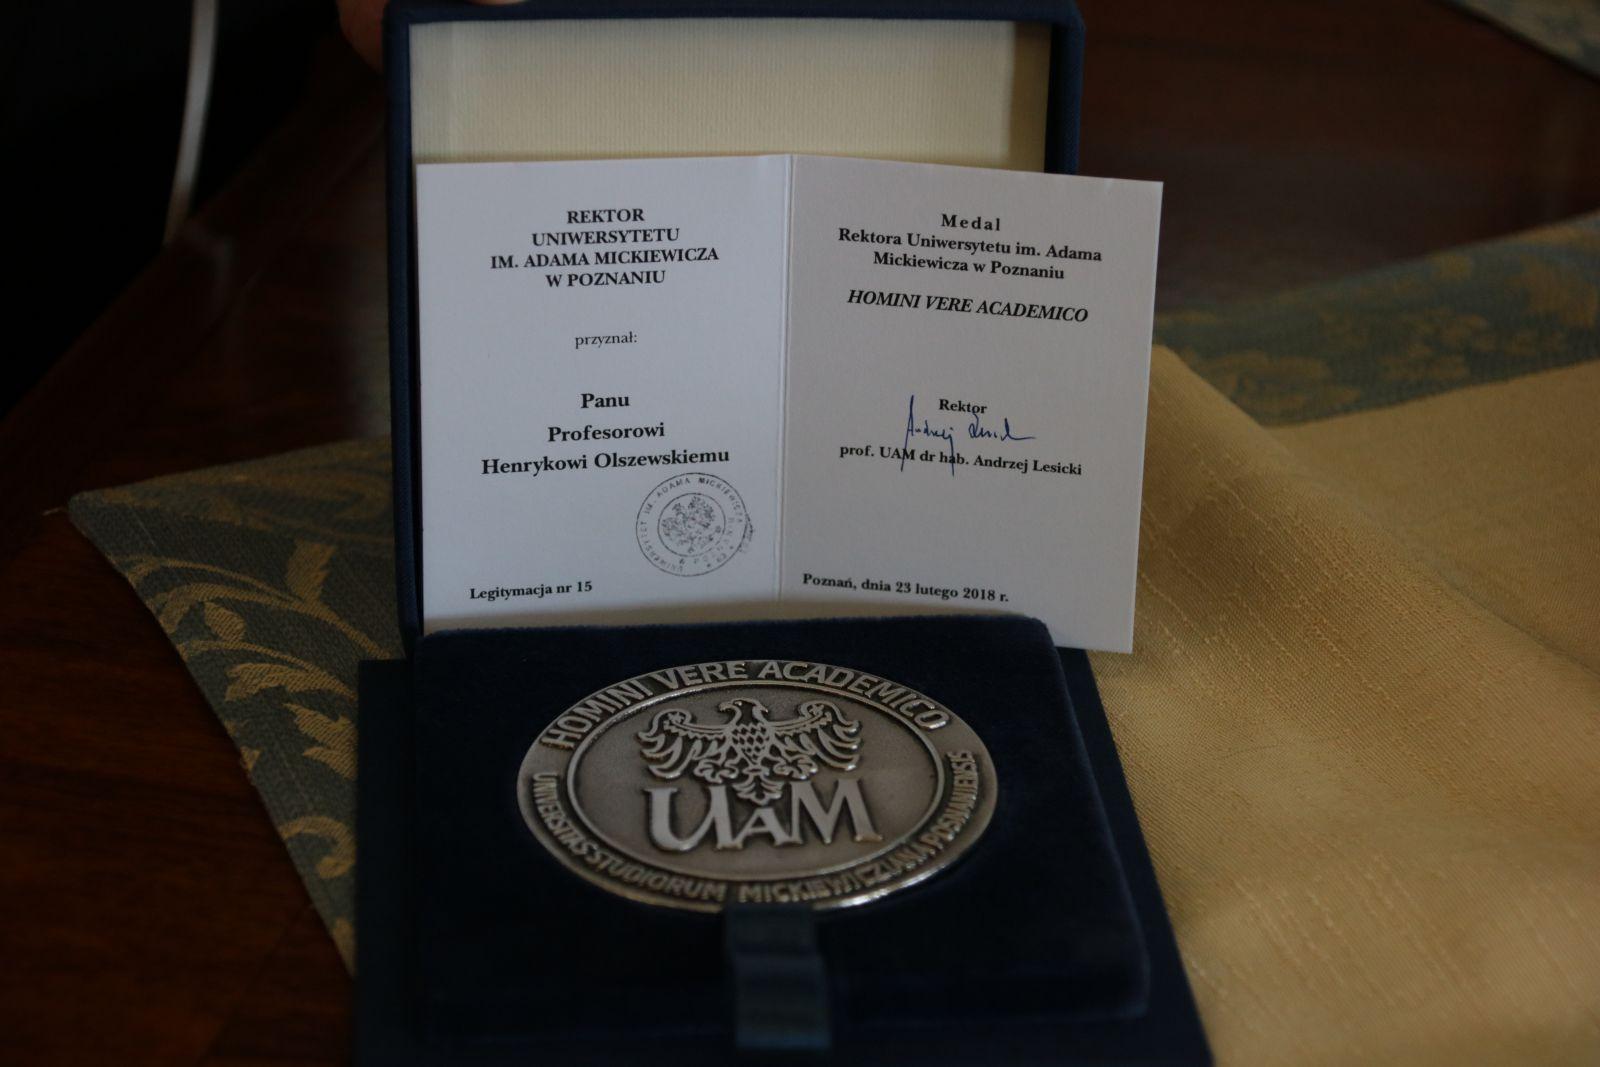 Medal Homini Vere Academico dla profesora Henryka Olszewskiego